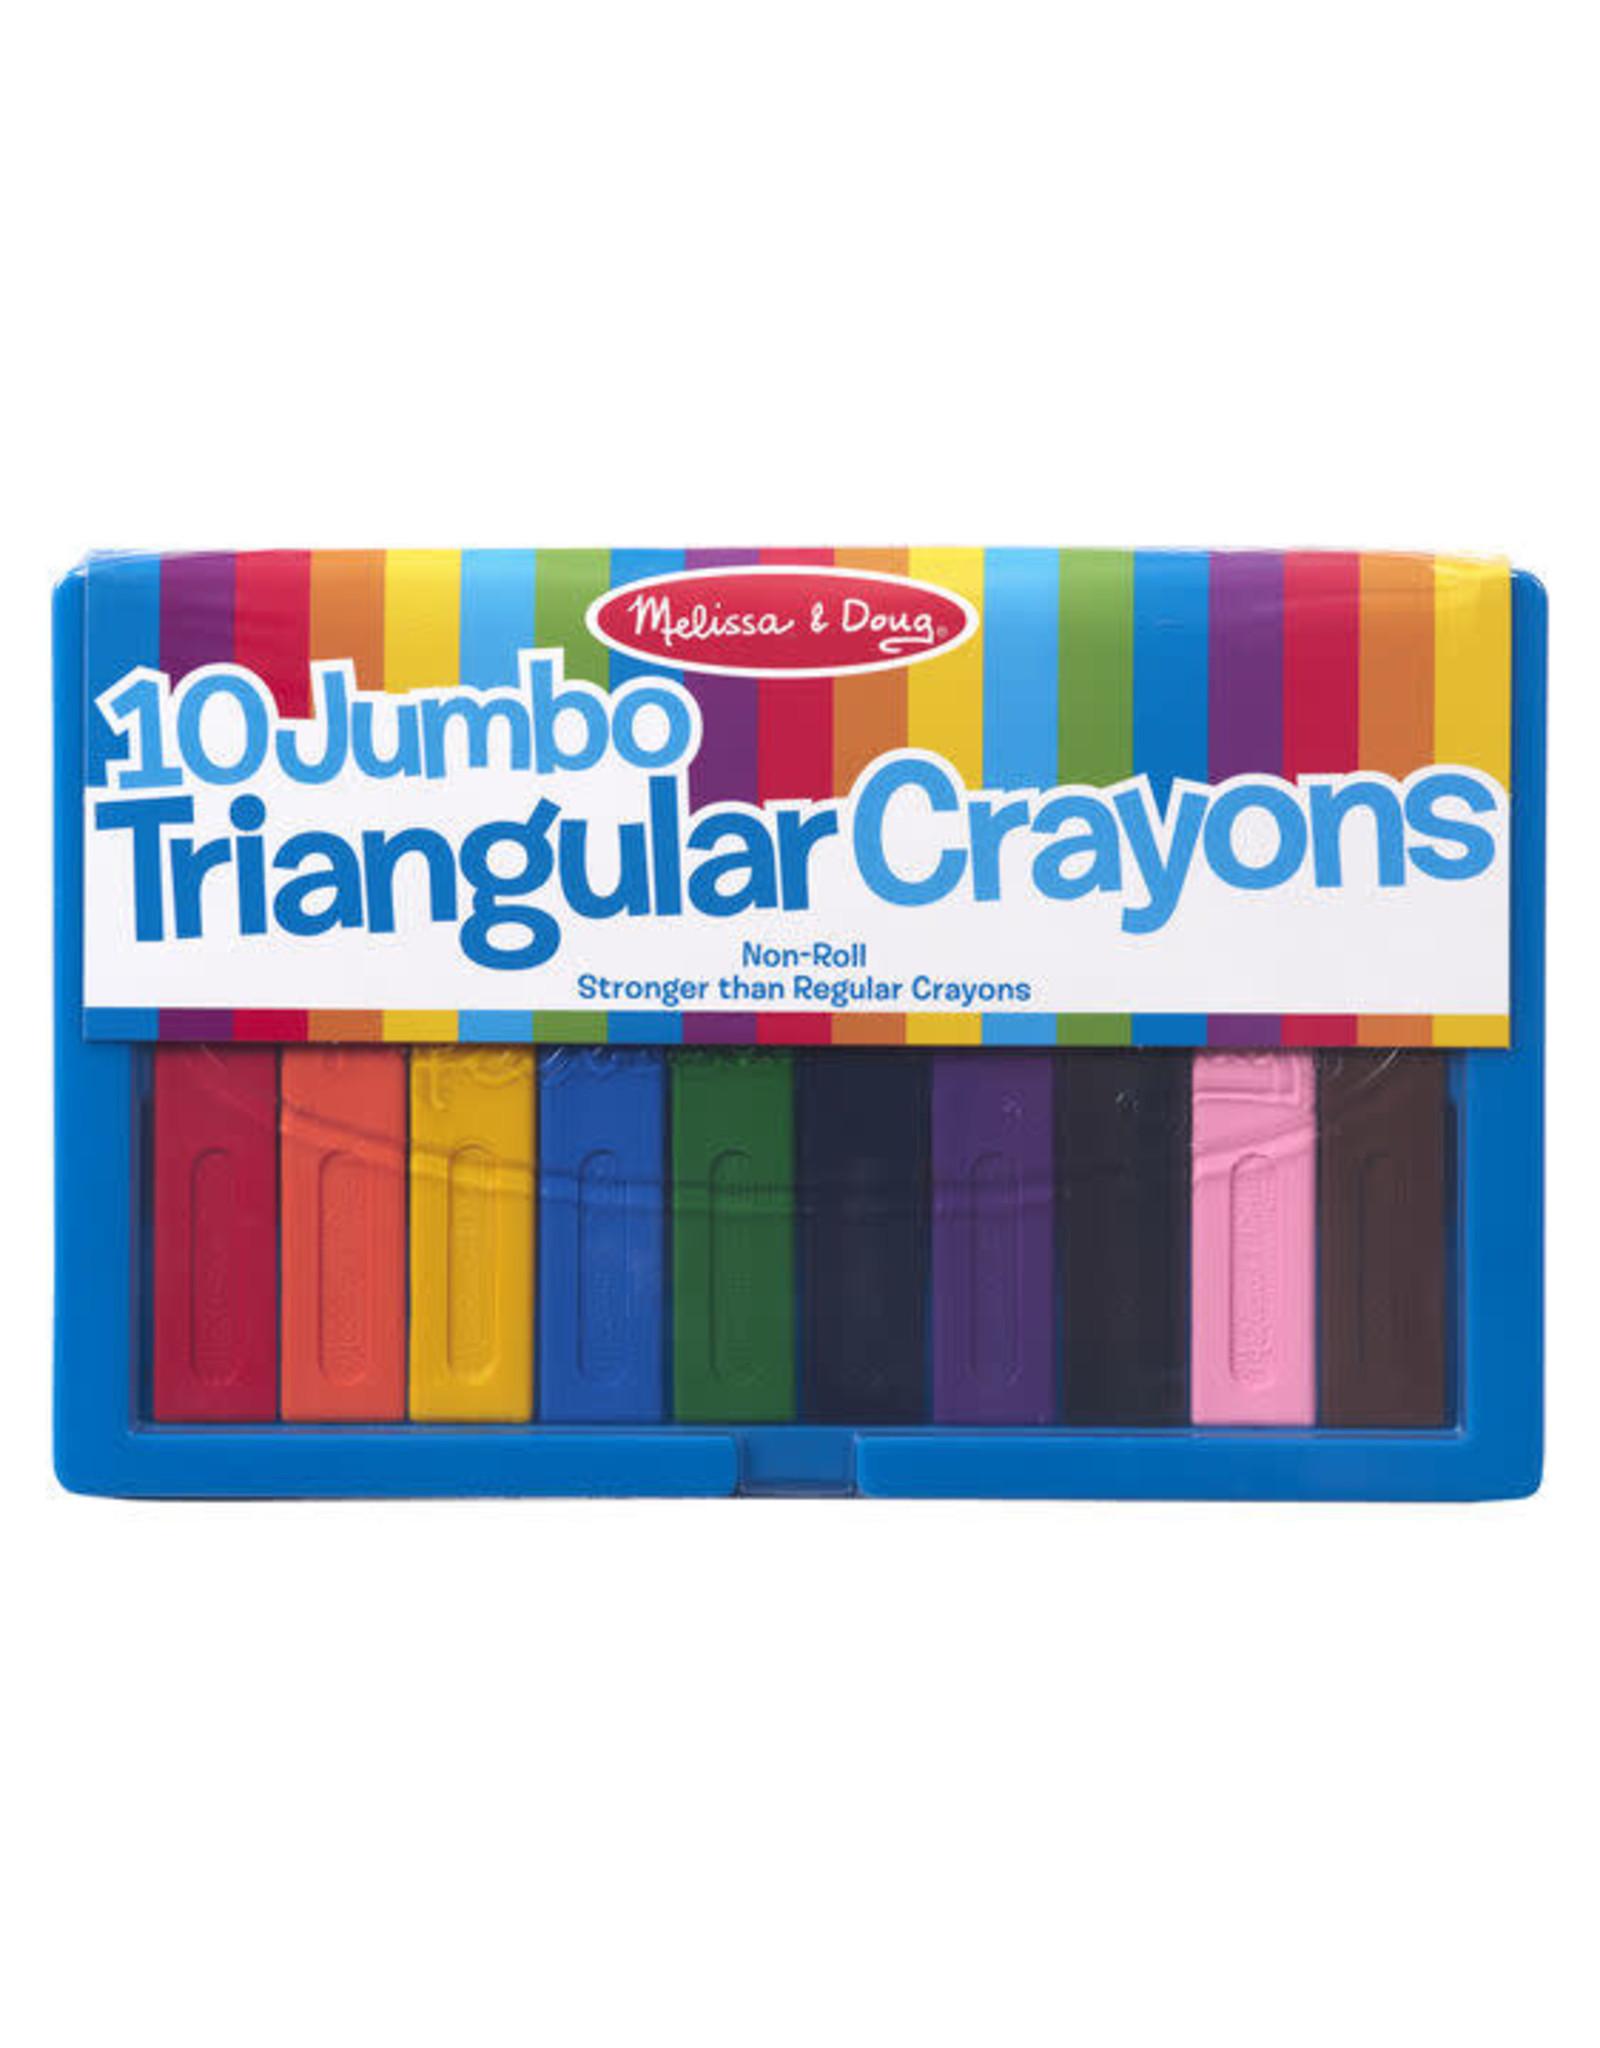 Melissa & Doug Jumbo Triangular Crayons (10 pc)